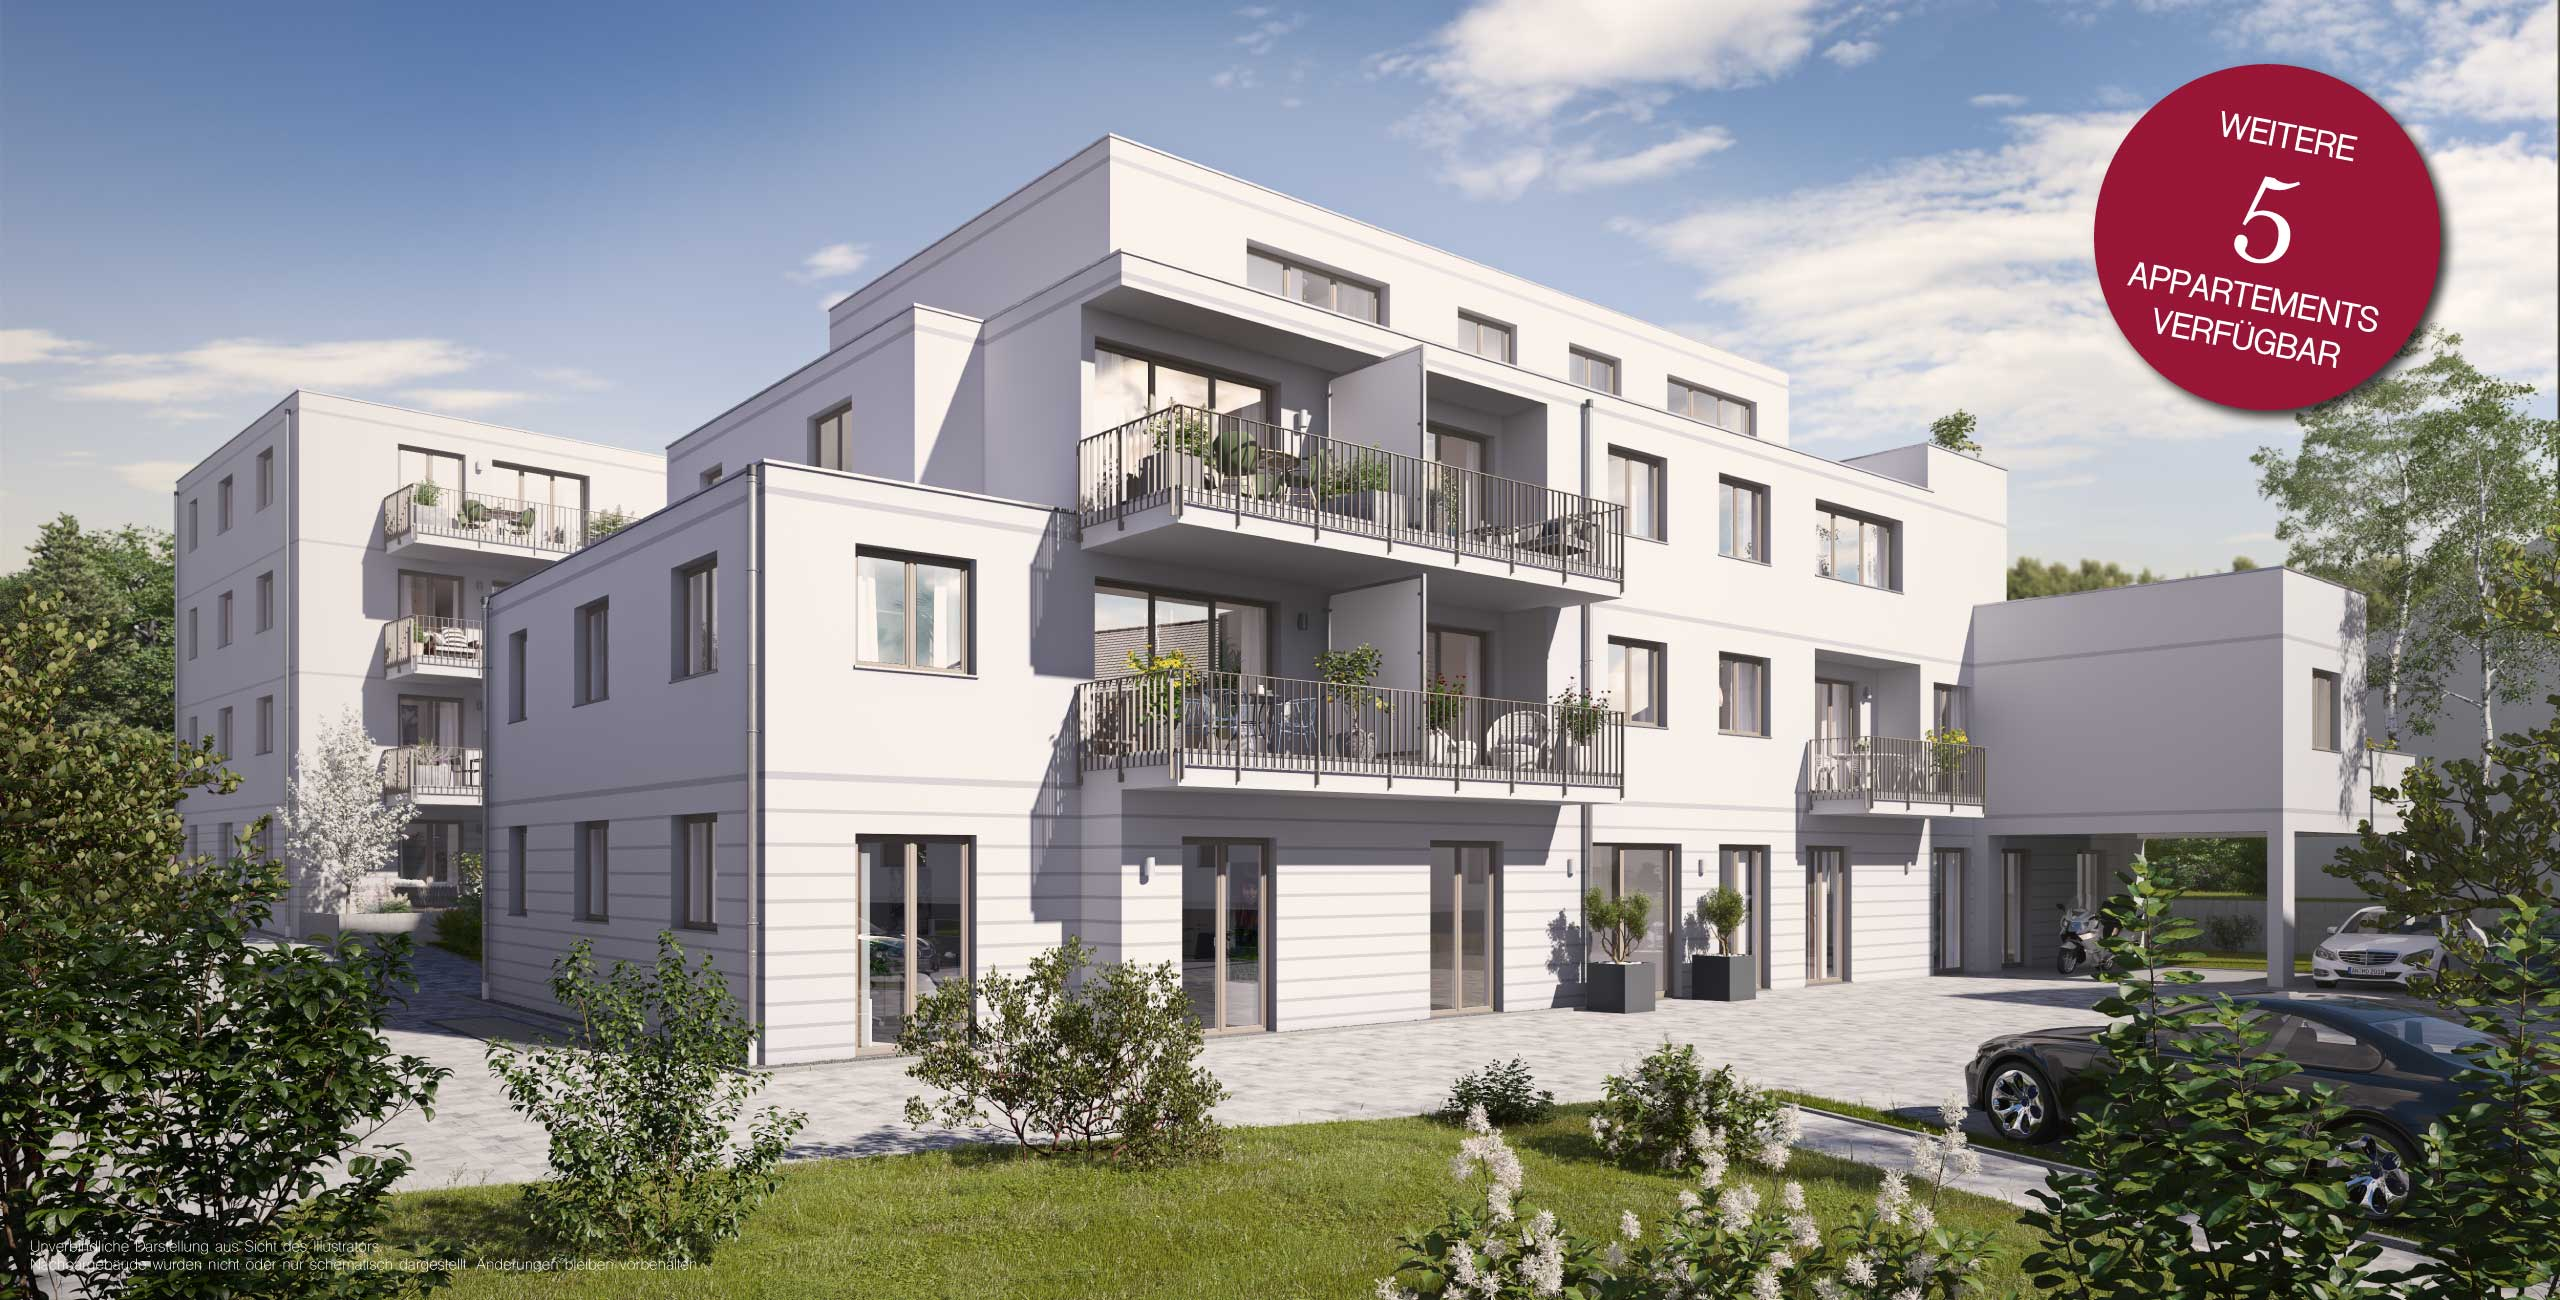 Verkaufsstart Ankündigung SUITES Appartements